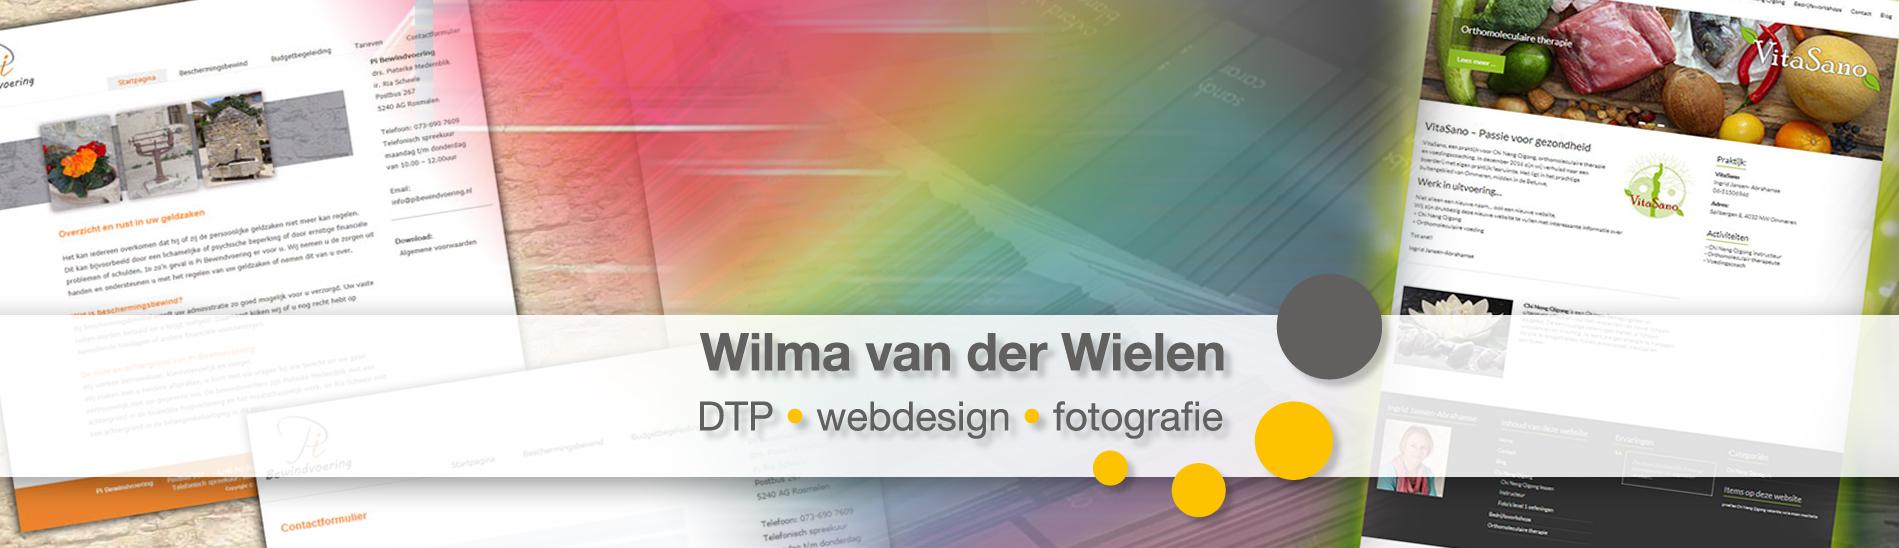 Webdesign met CMS